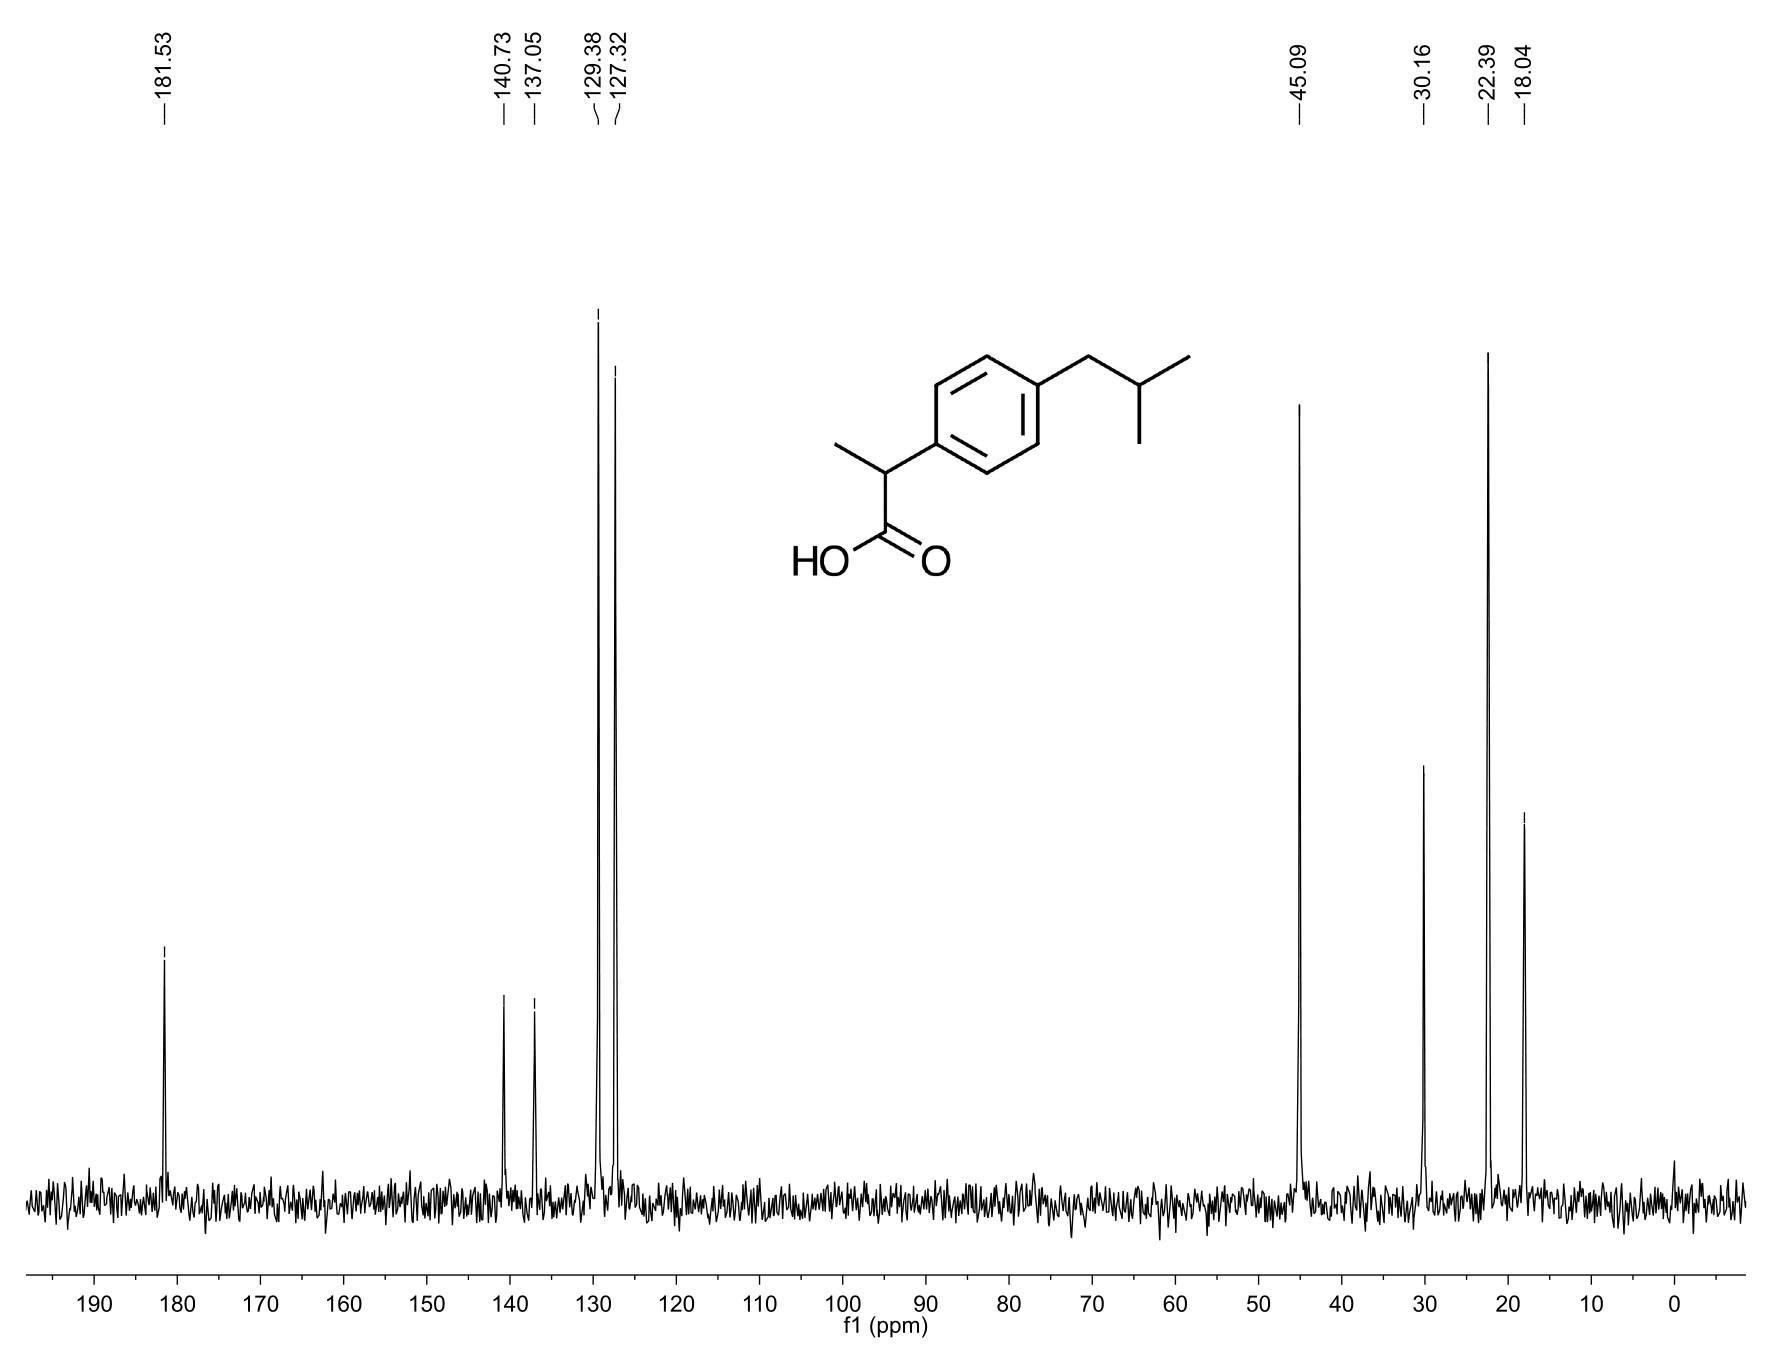 Anasazi Instruments Ibuprofen 13C with molecular structure graph